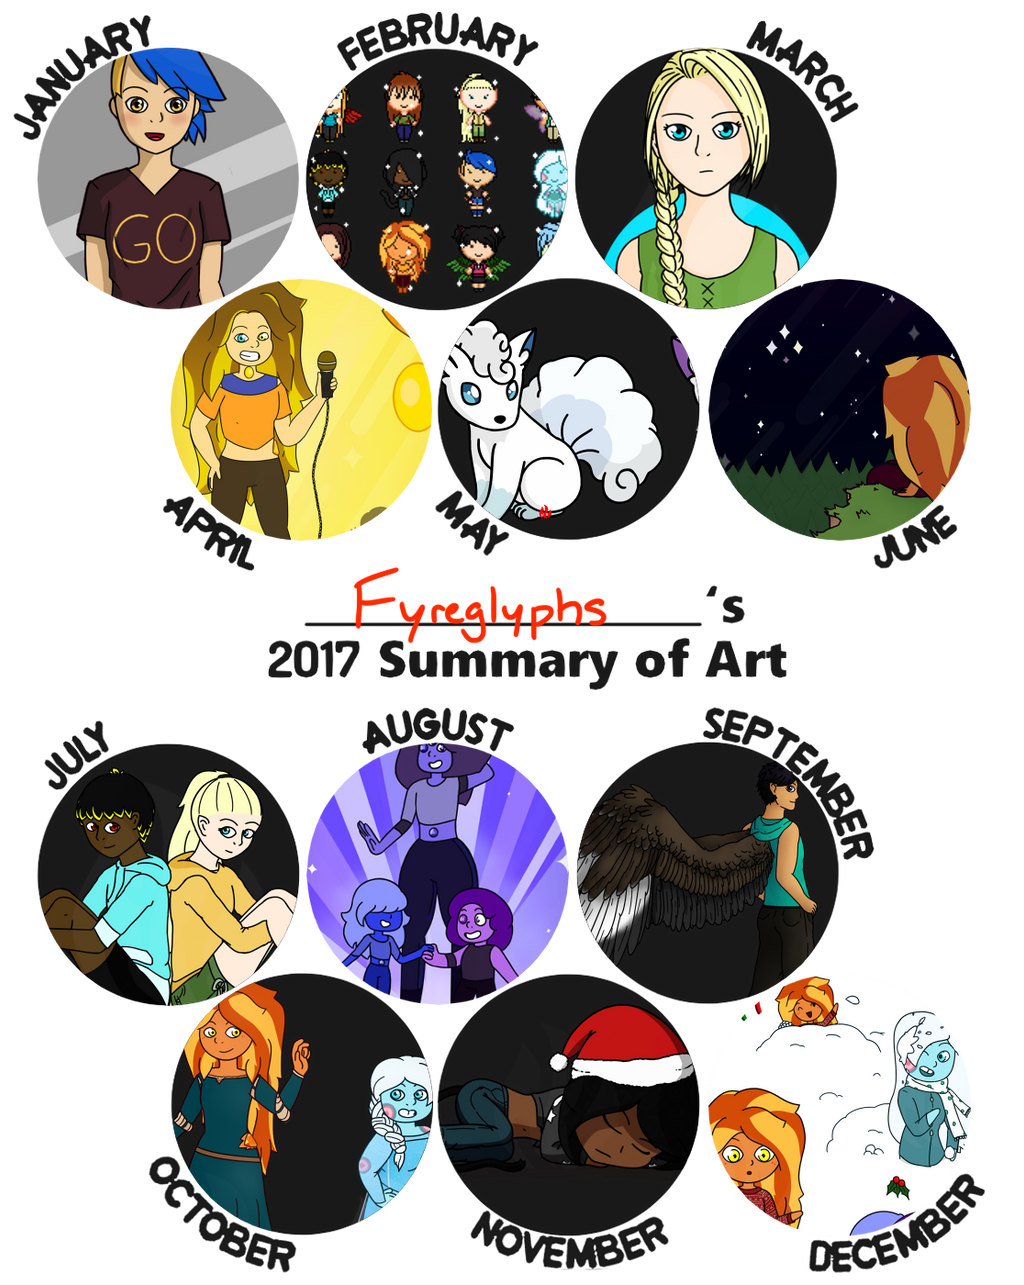 Fyreglyphs' 2017 Summary of Art by Fyreglyphs